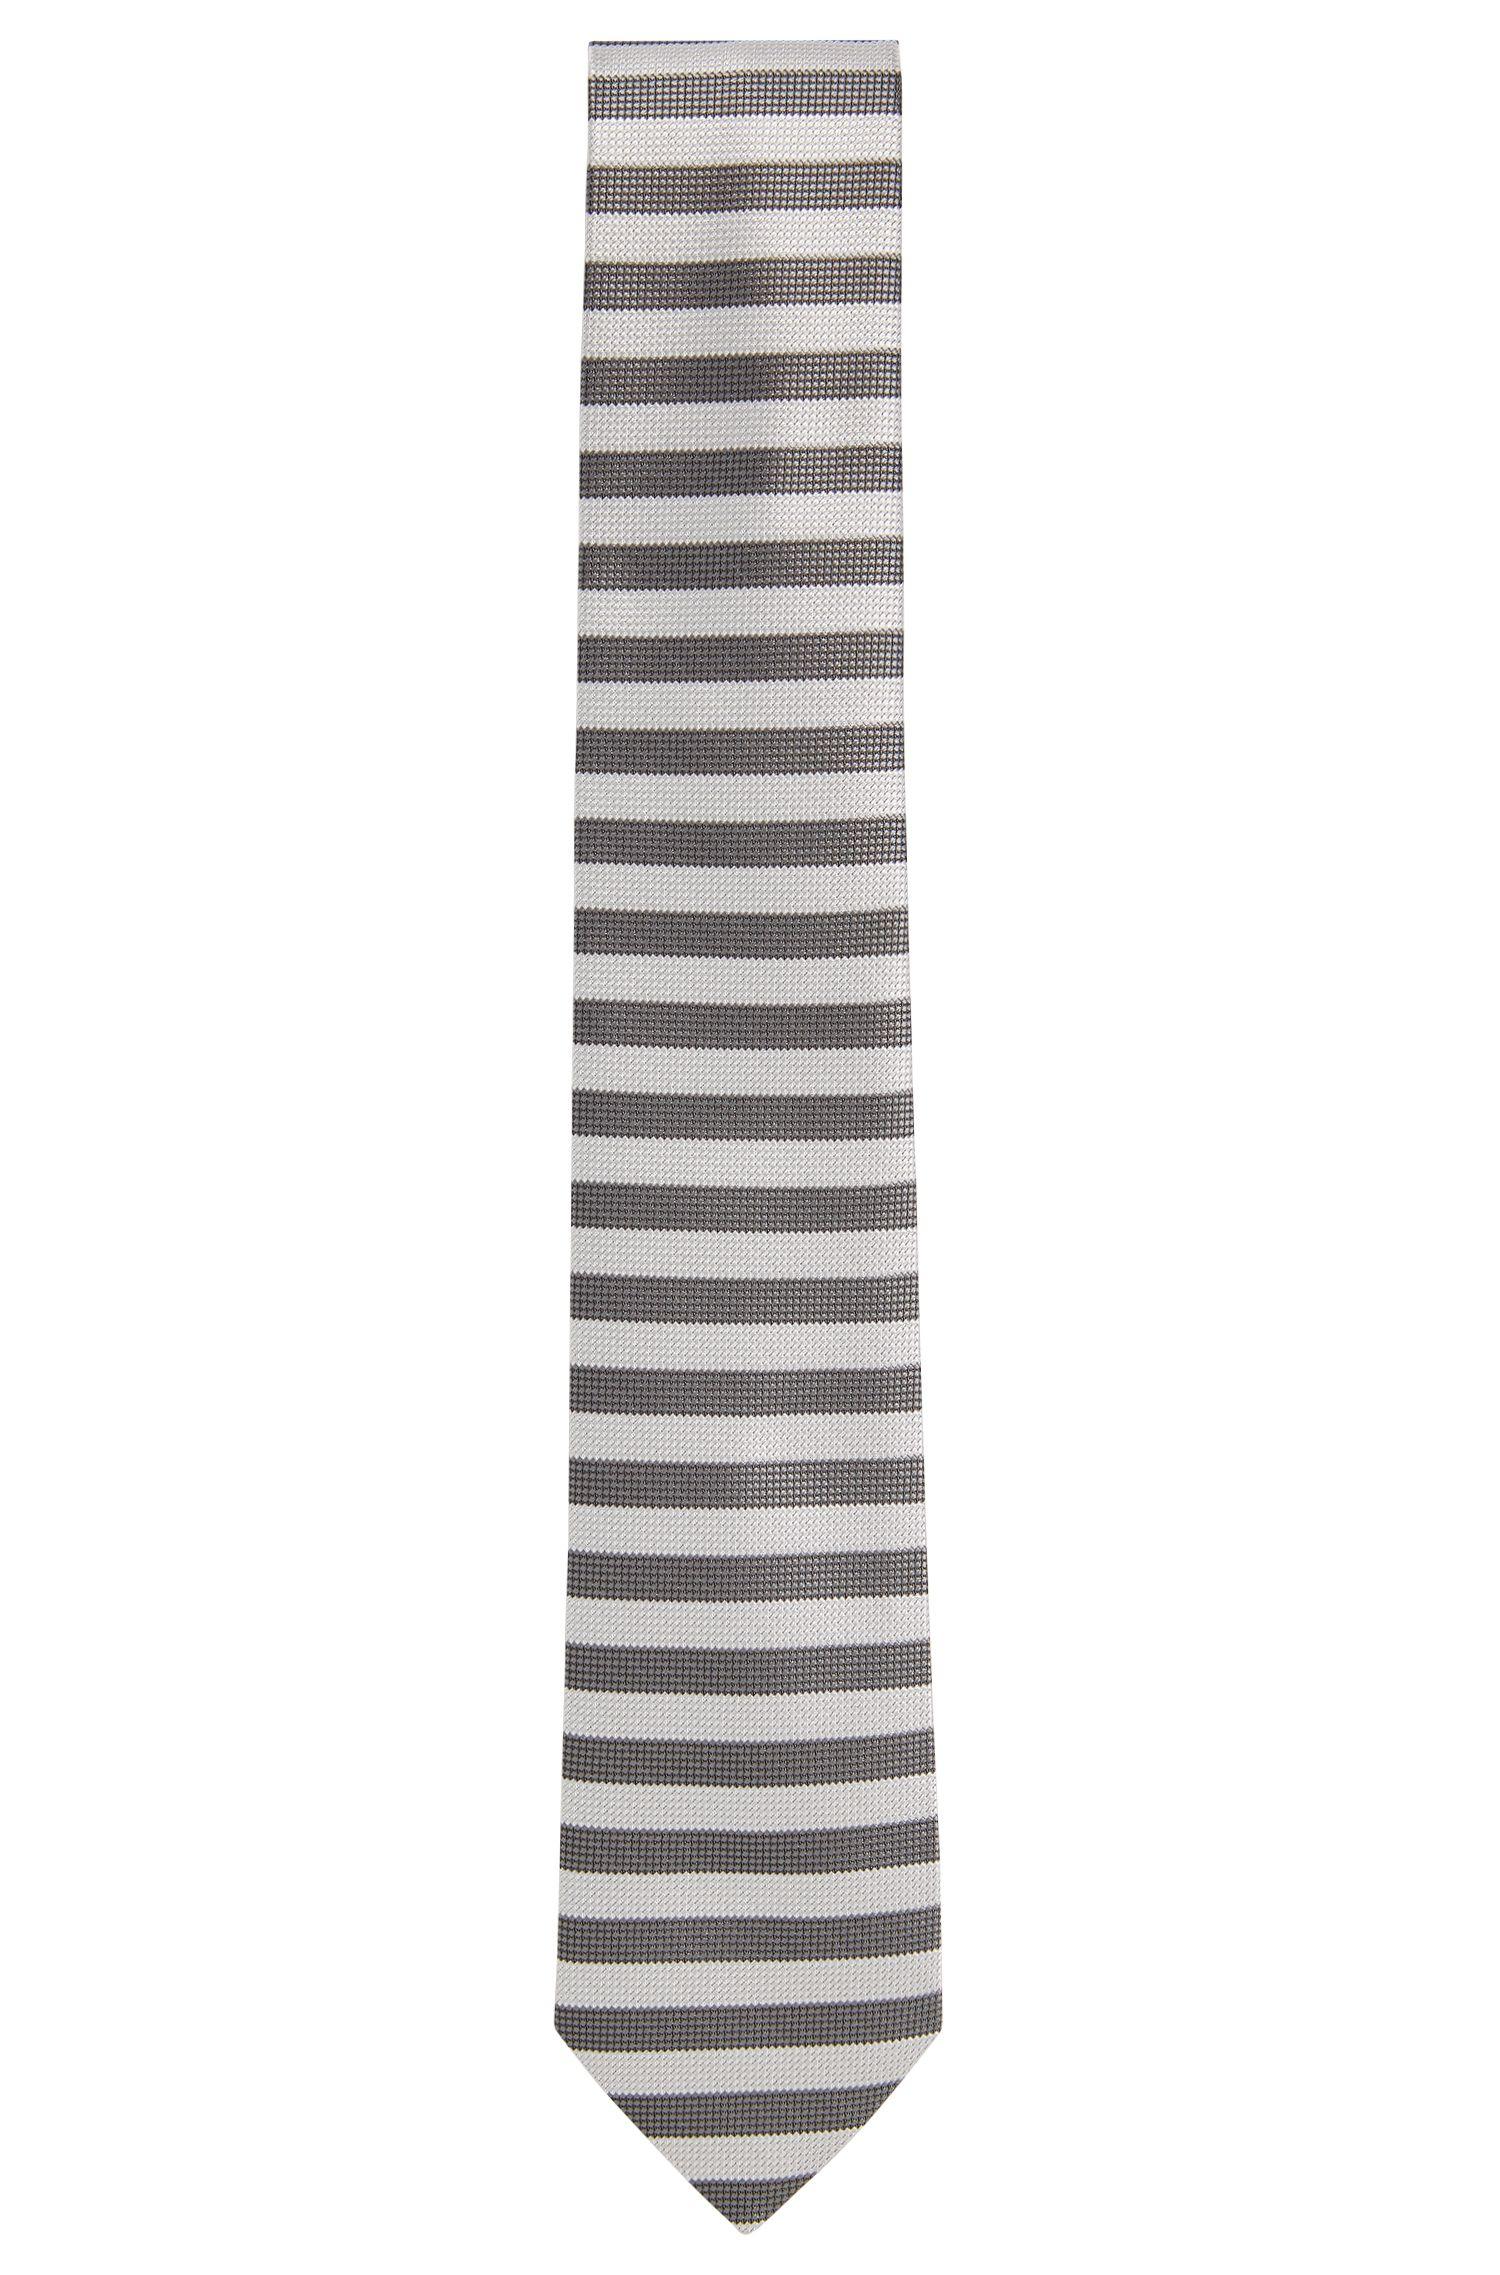 Jacquard-Krawatte aus Seide mit Muster in Kontrastfarbe